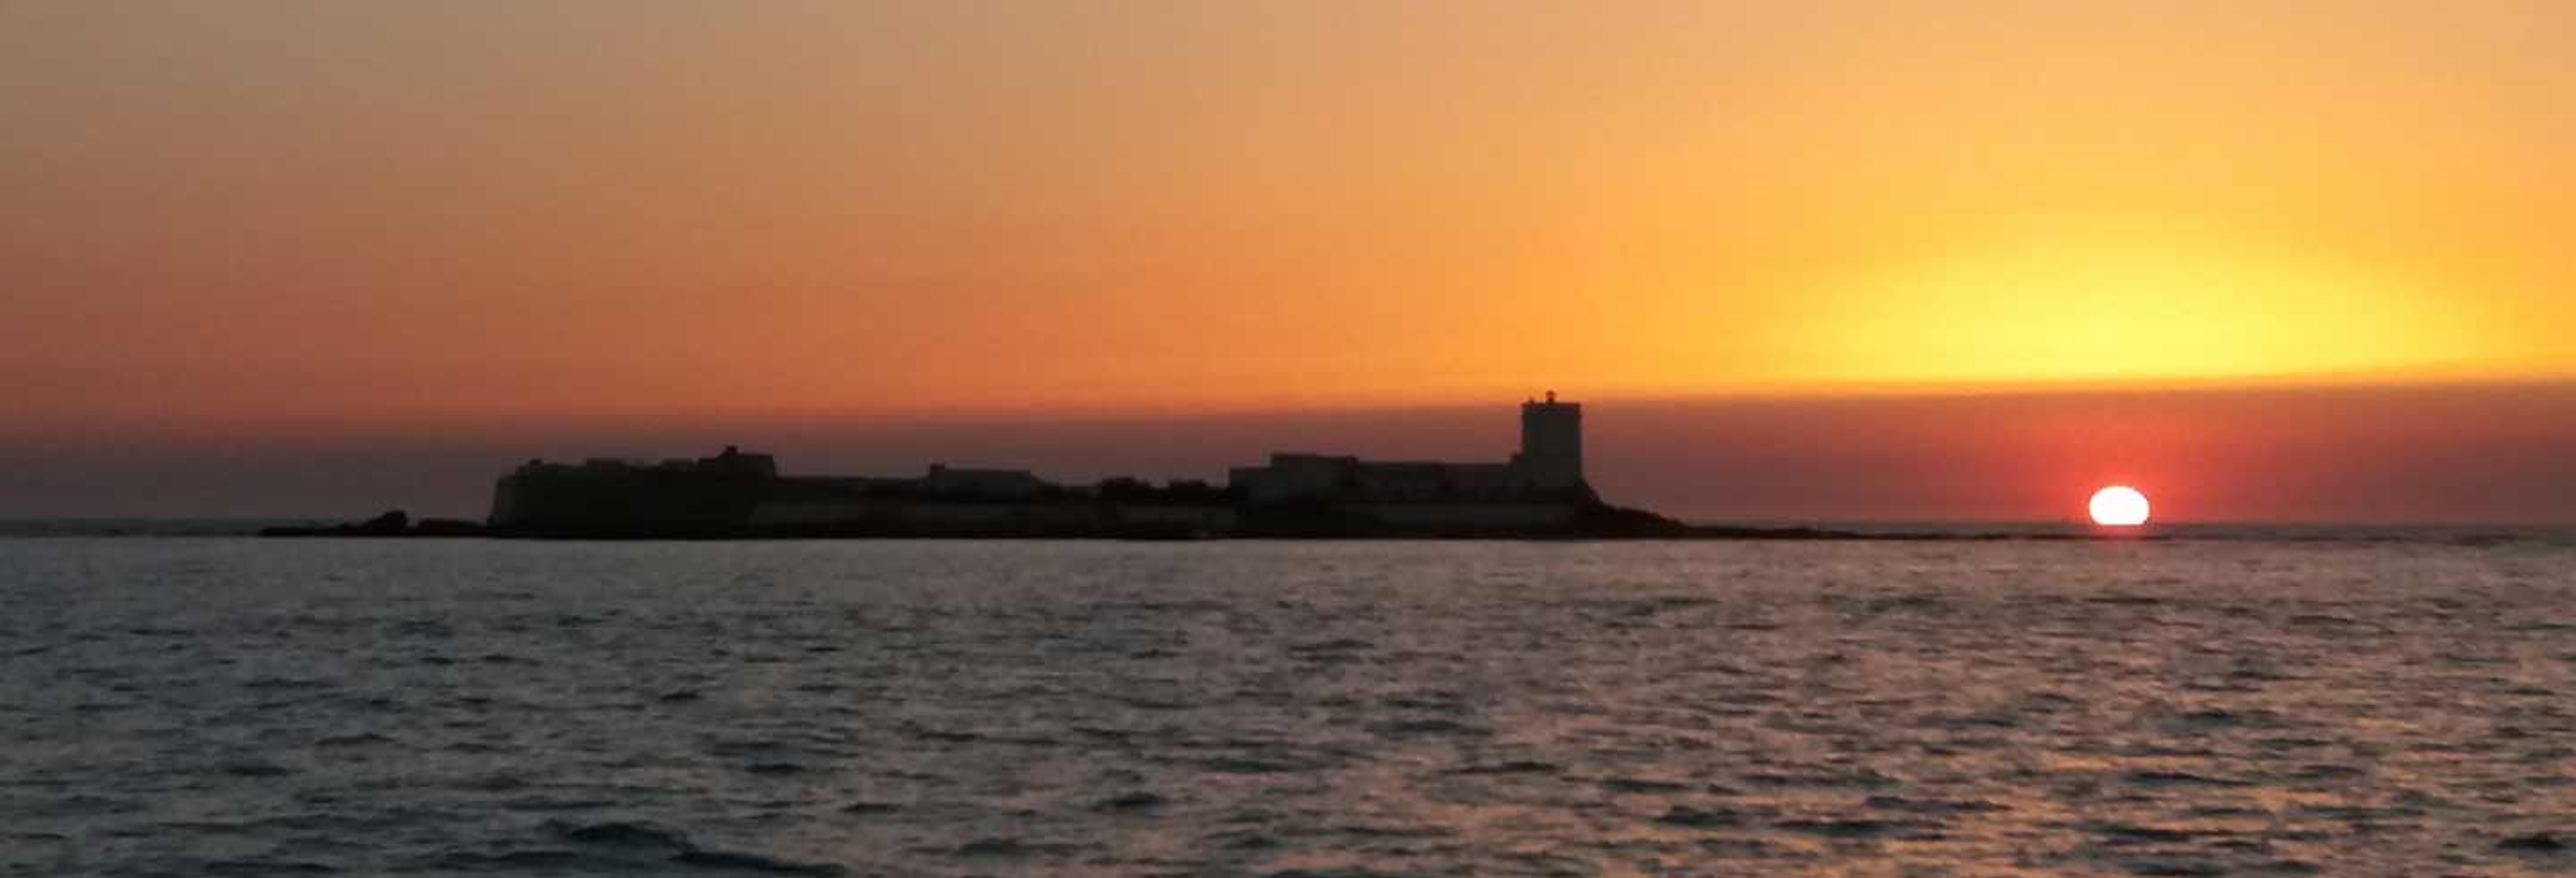 Giro in barca al tramonto